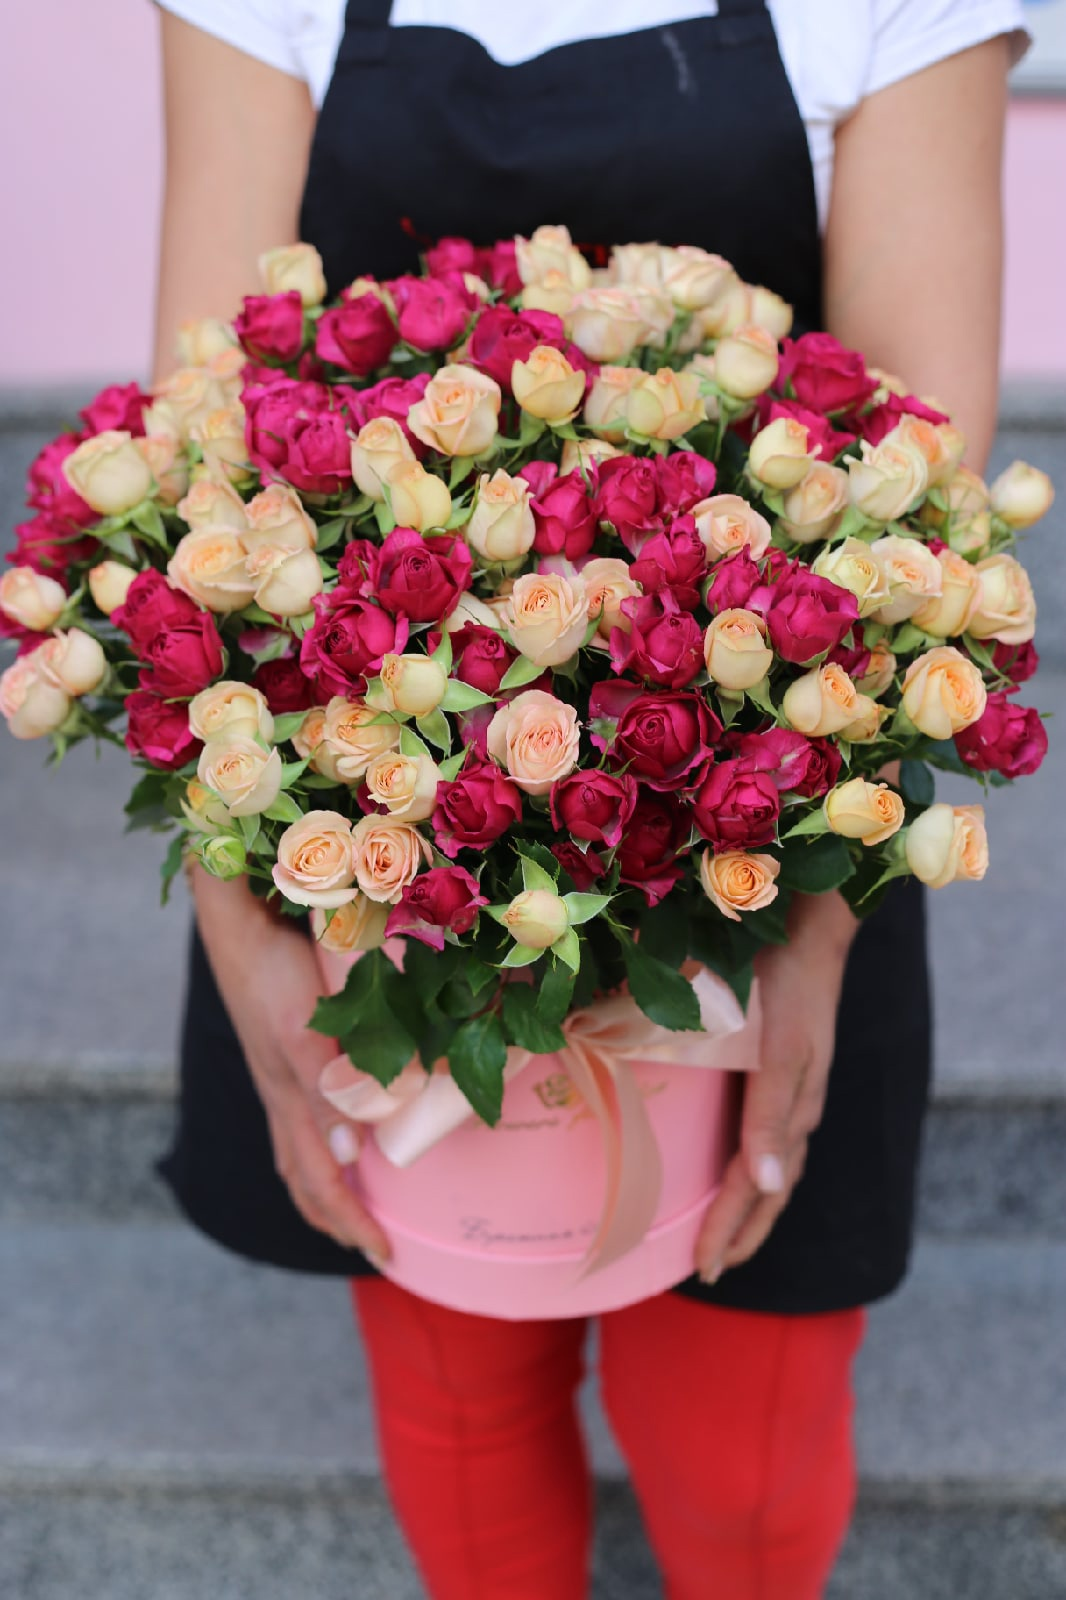 51 кустовая роза в коробке